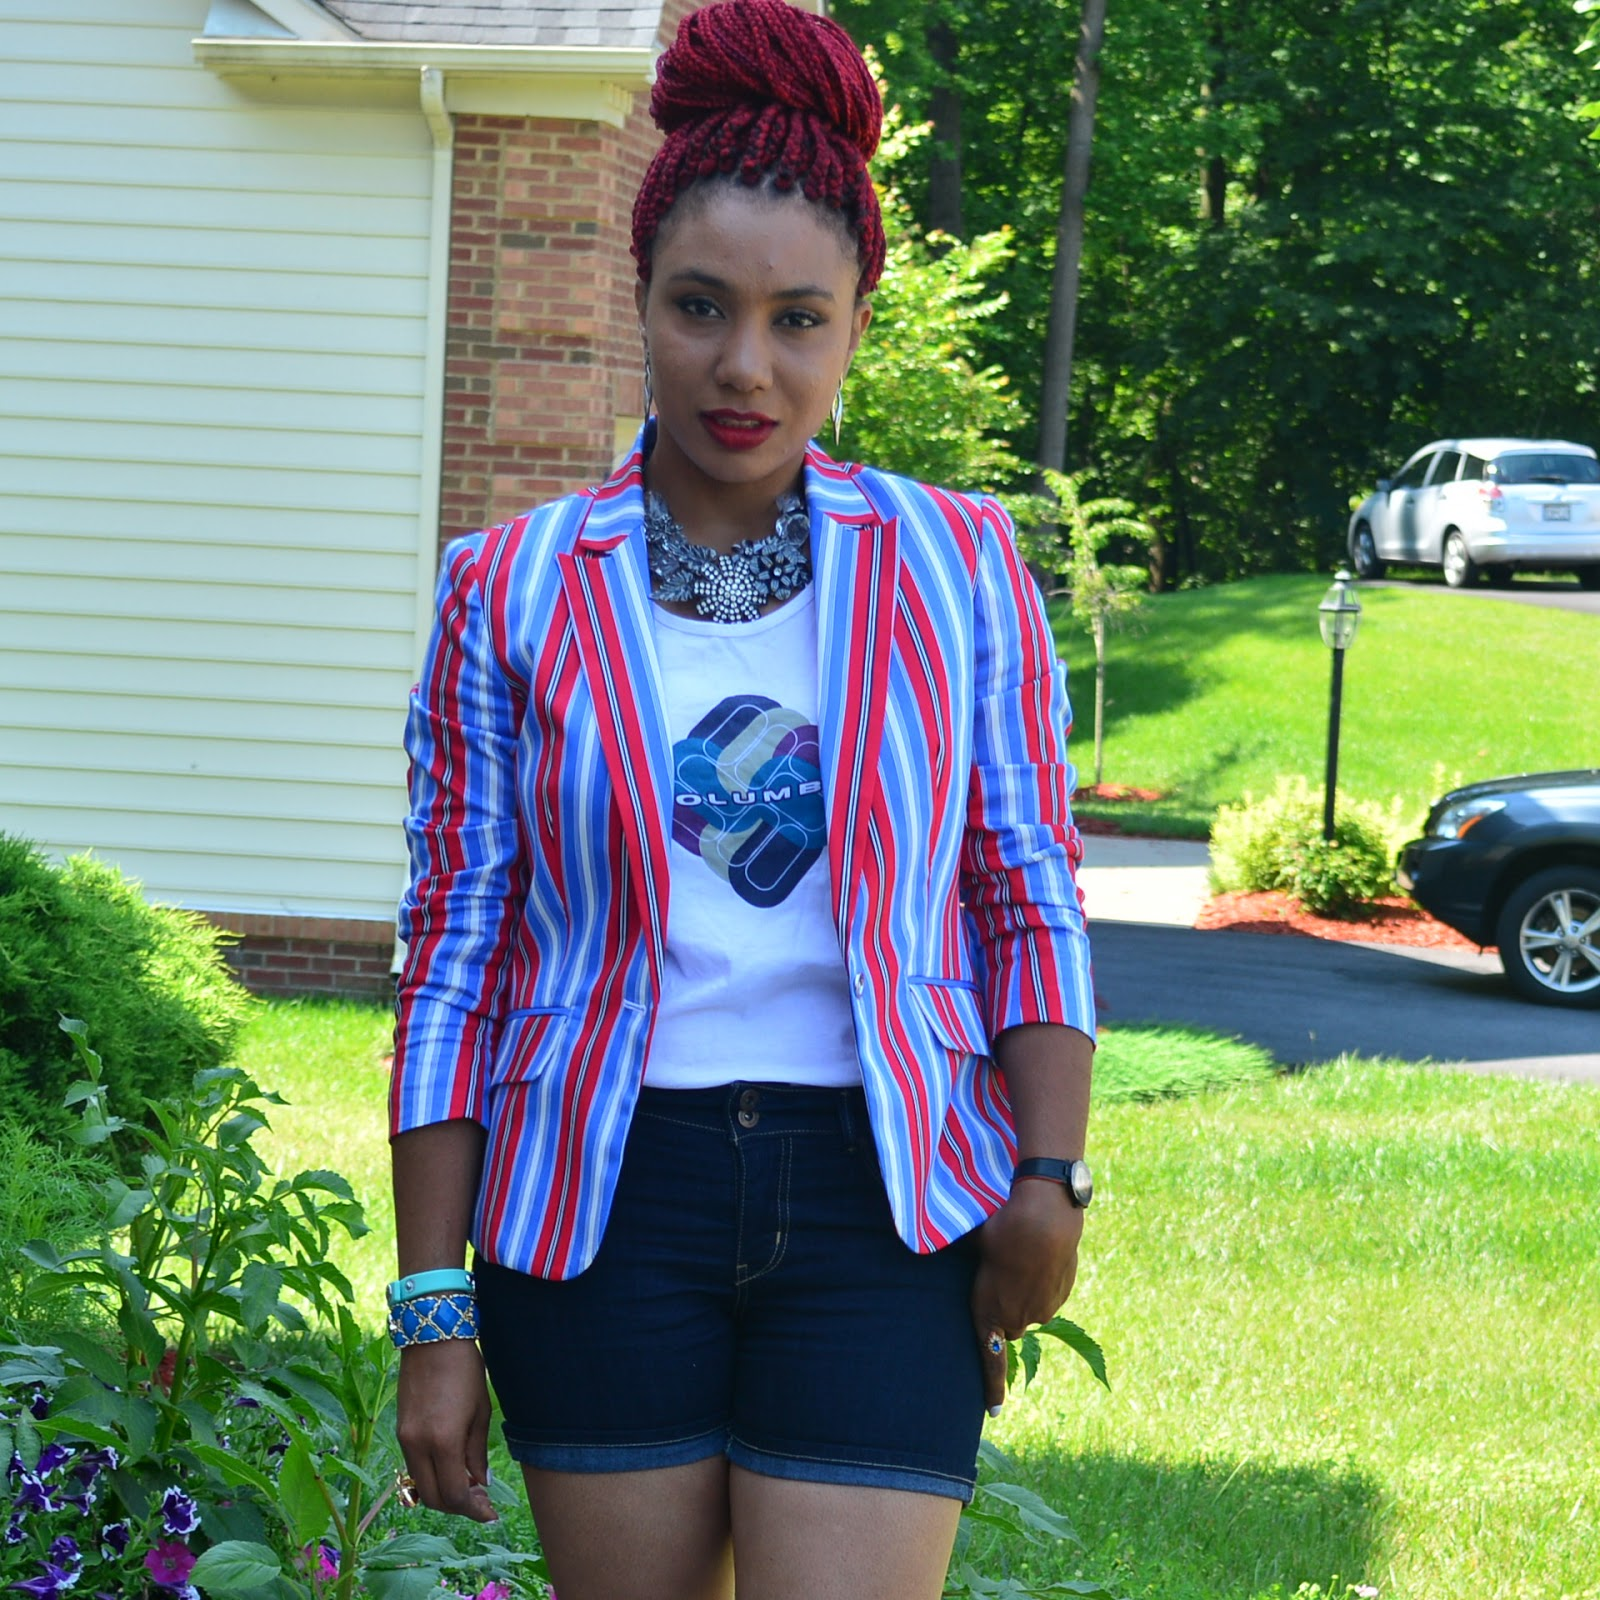 Milly styles : Striped Blazer + Jeans shorts